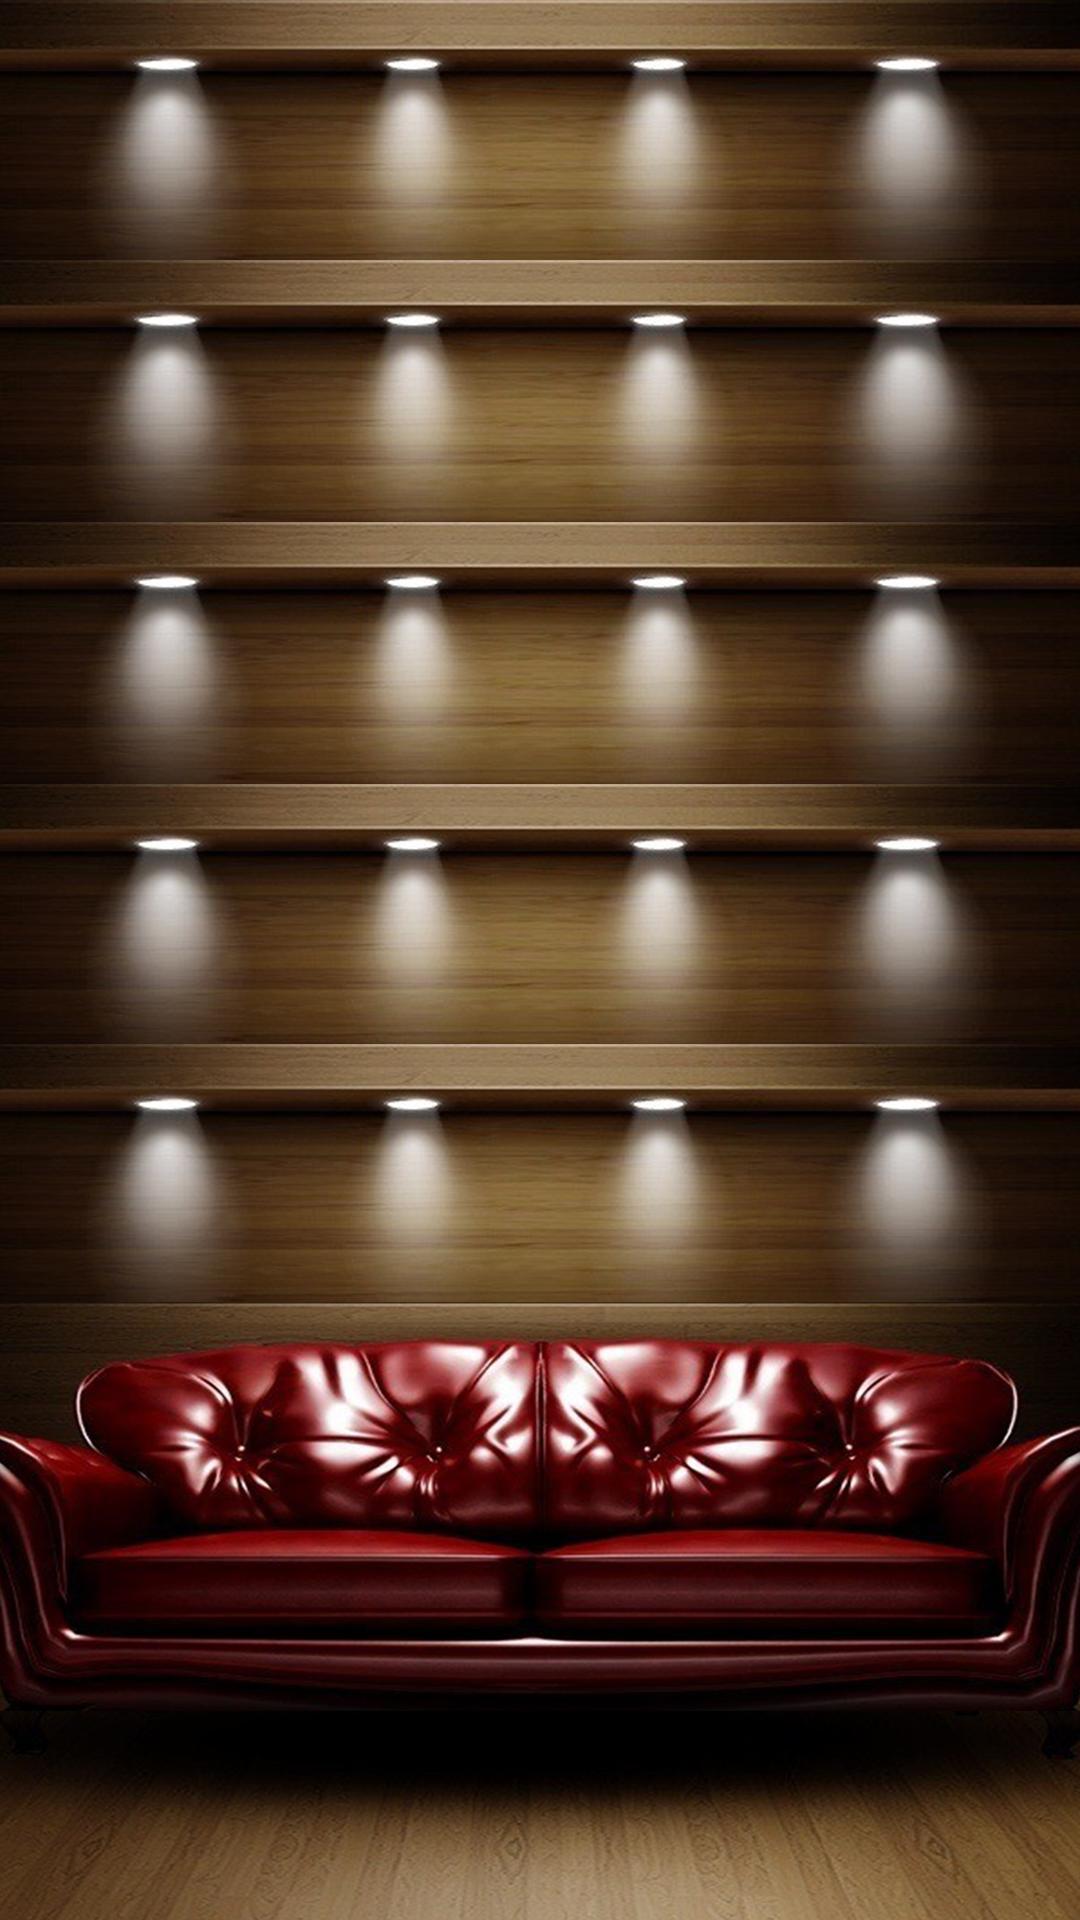 25+ Iphone Shelf Wallpaper  Wallpapers